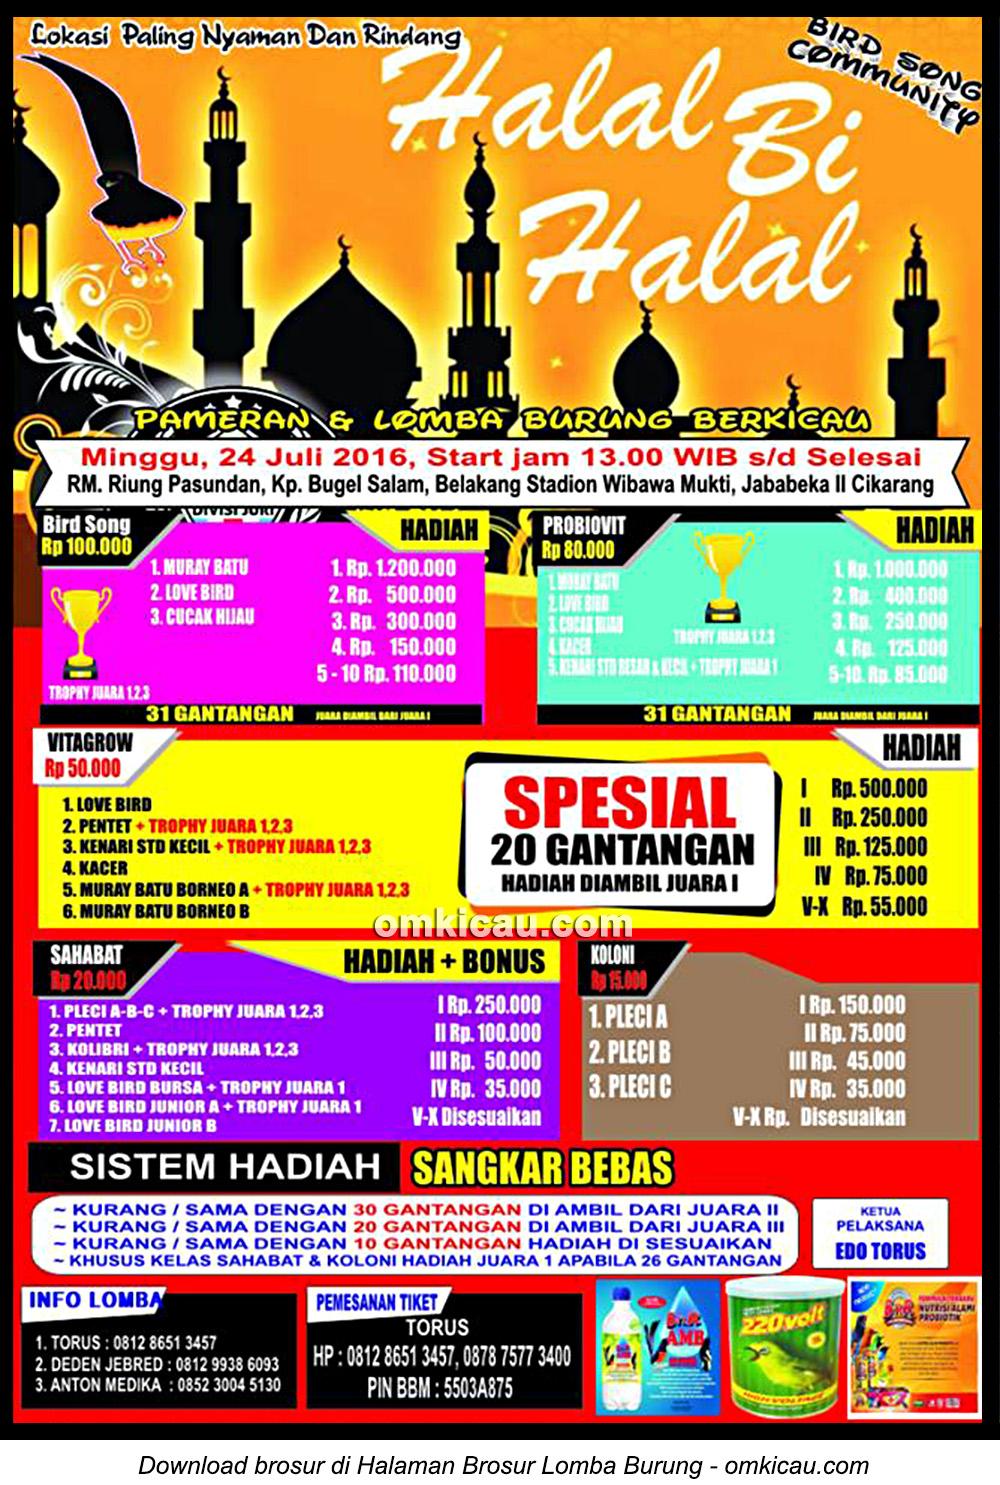 Brosur Lomba Burung Berkicau Halal Bi Halal Bird Song Community, Cikarang, 24 Juli 2016